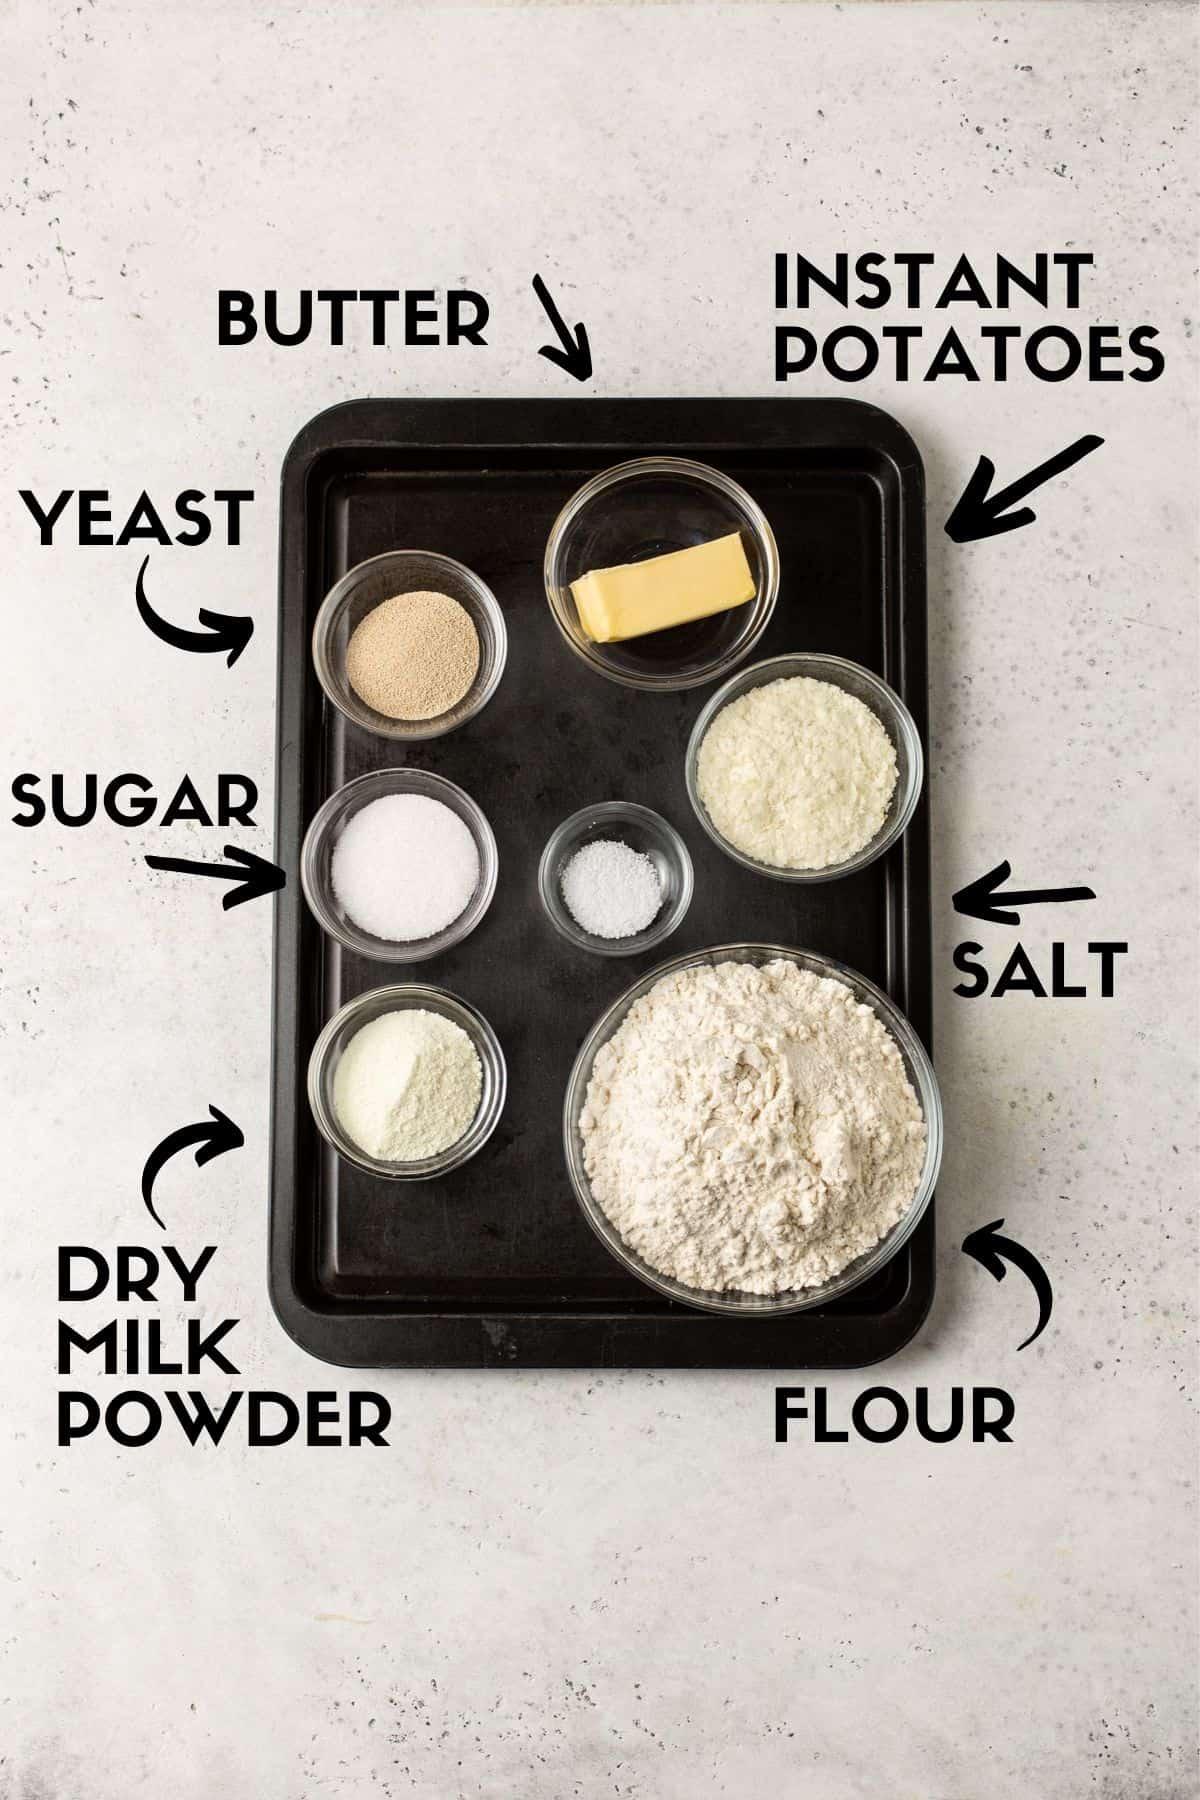 Potato roll ingredients including flour, butter, yeast, salt, sugar, dry milk powder & instant potatoes.